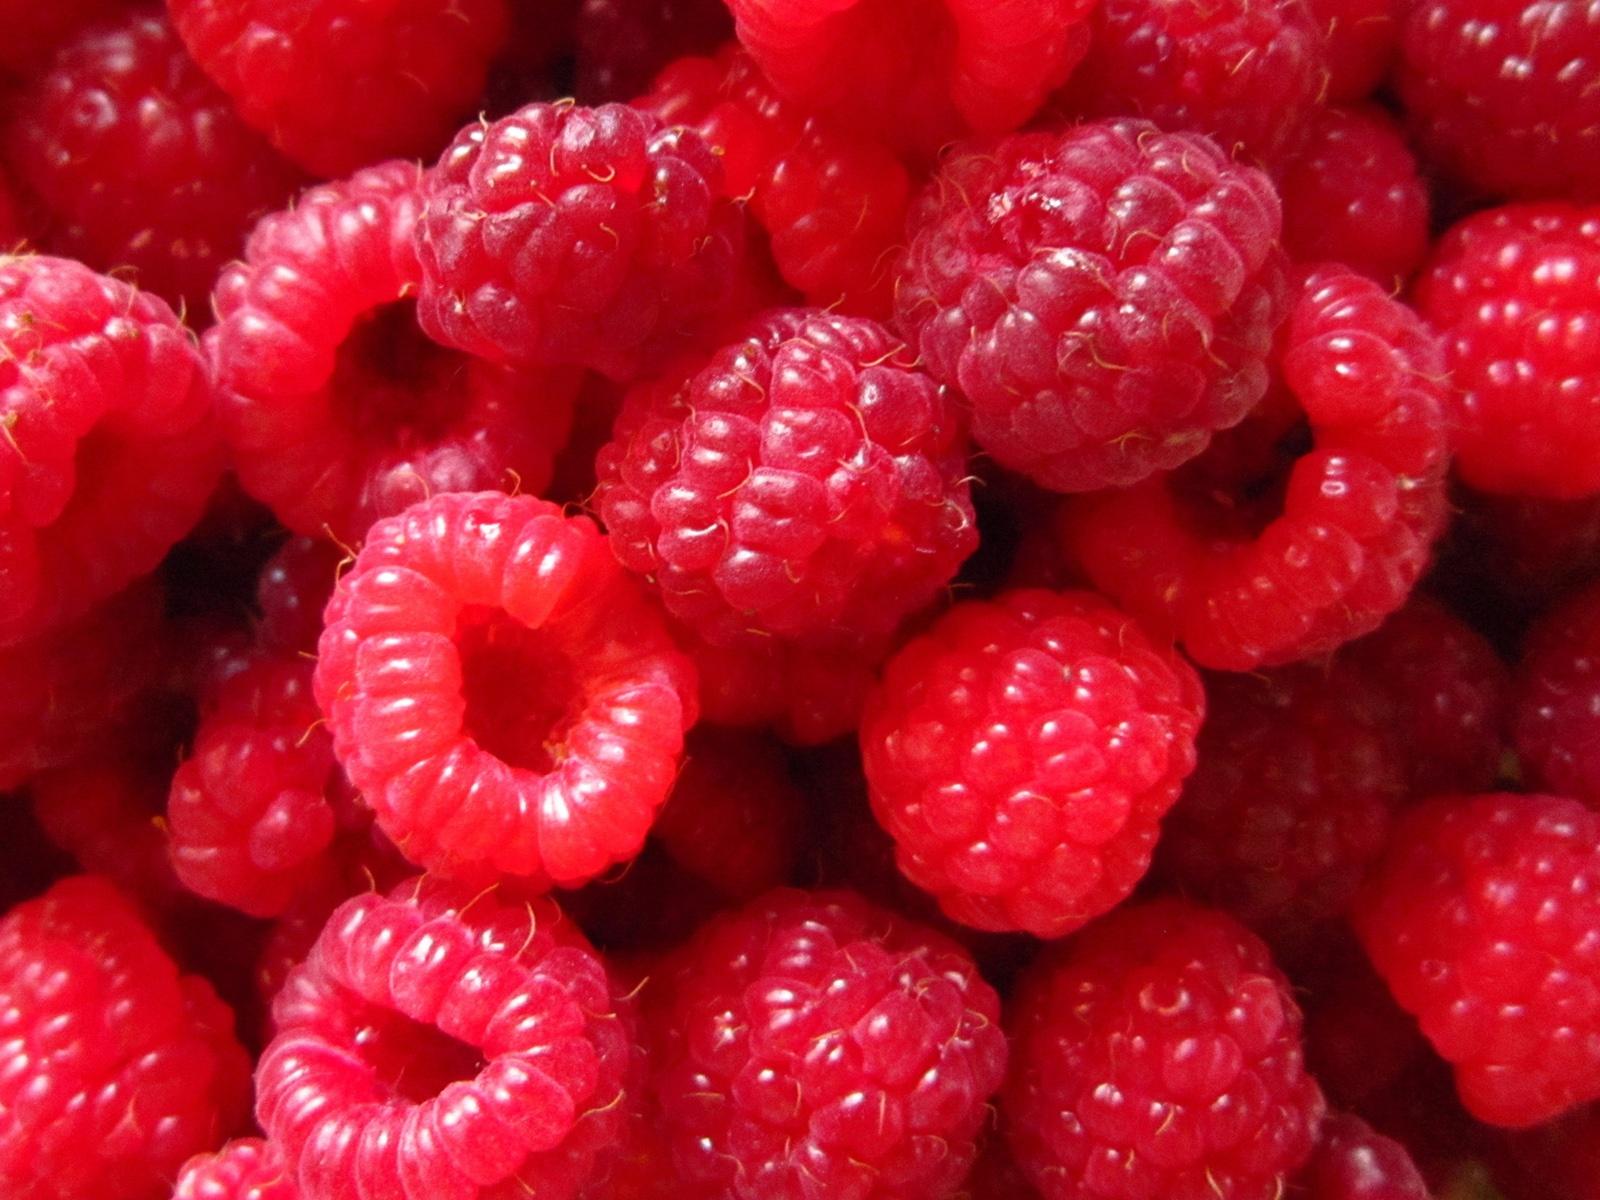 Tiny Plants Red Berry Wallpaper Wallpapersafari